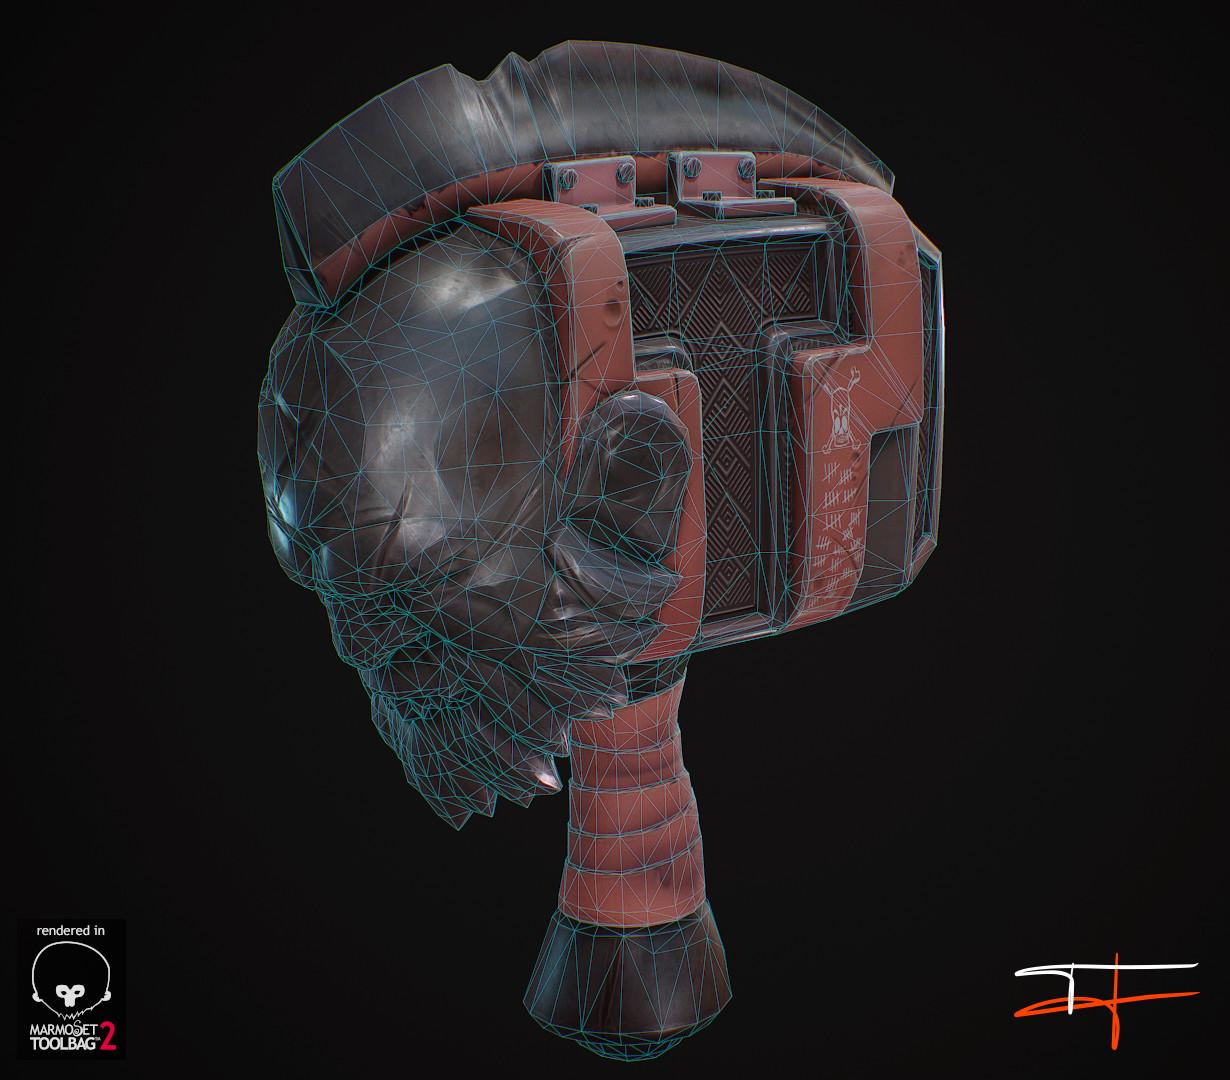 Tim jacksteit hammer shot005